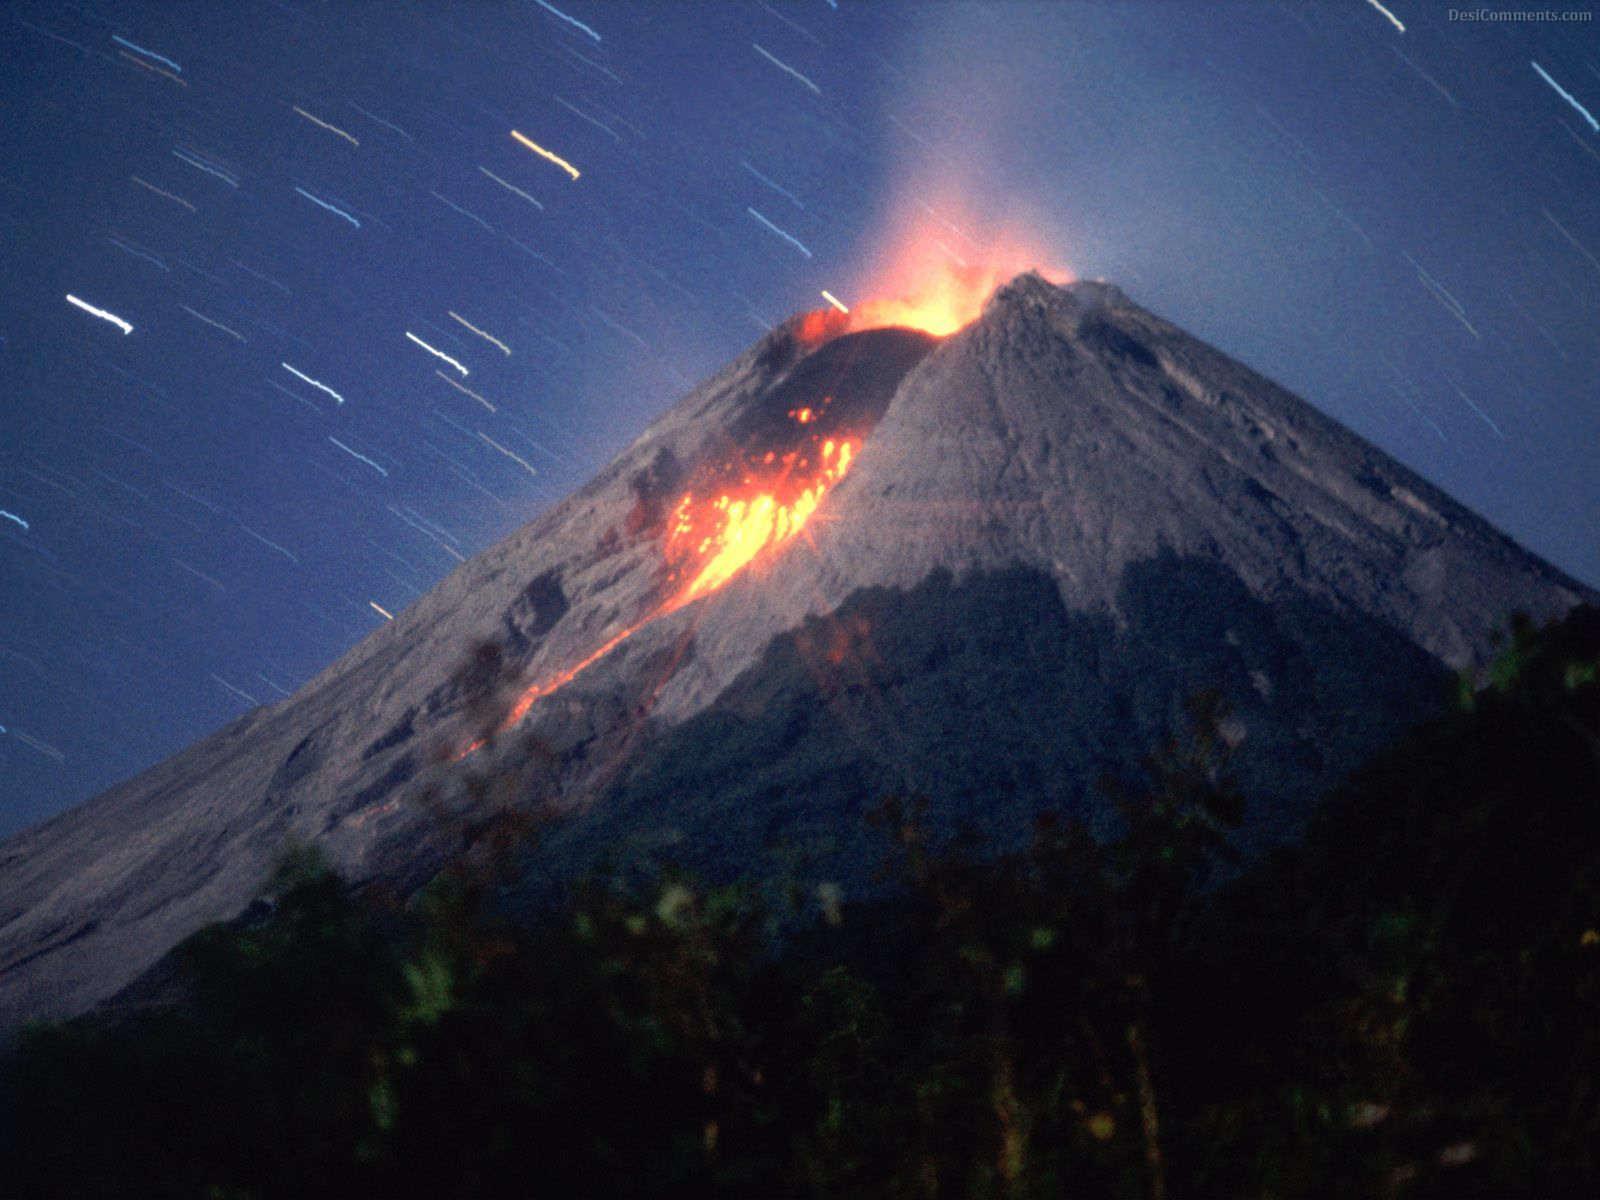 Volcano Wallpaper 4 1600x1200